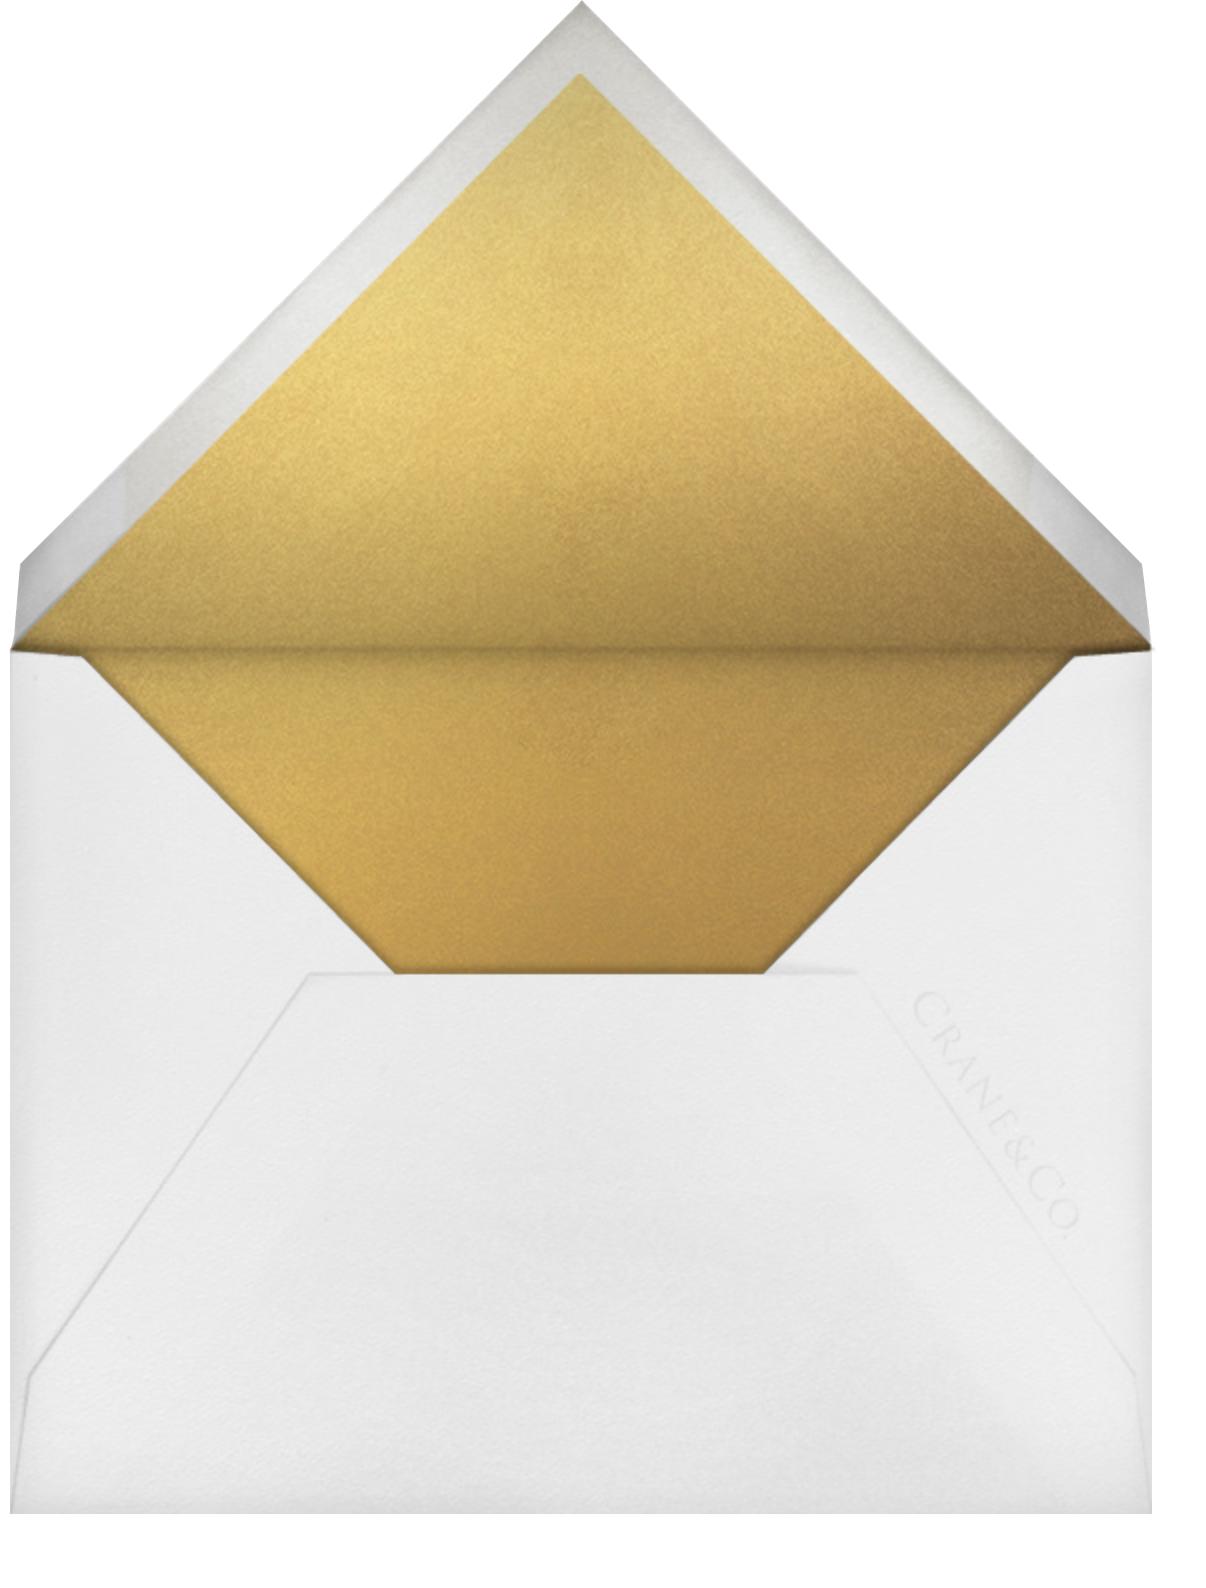 Notch - Gold - Vera Wang - Anniversary party - envelope back